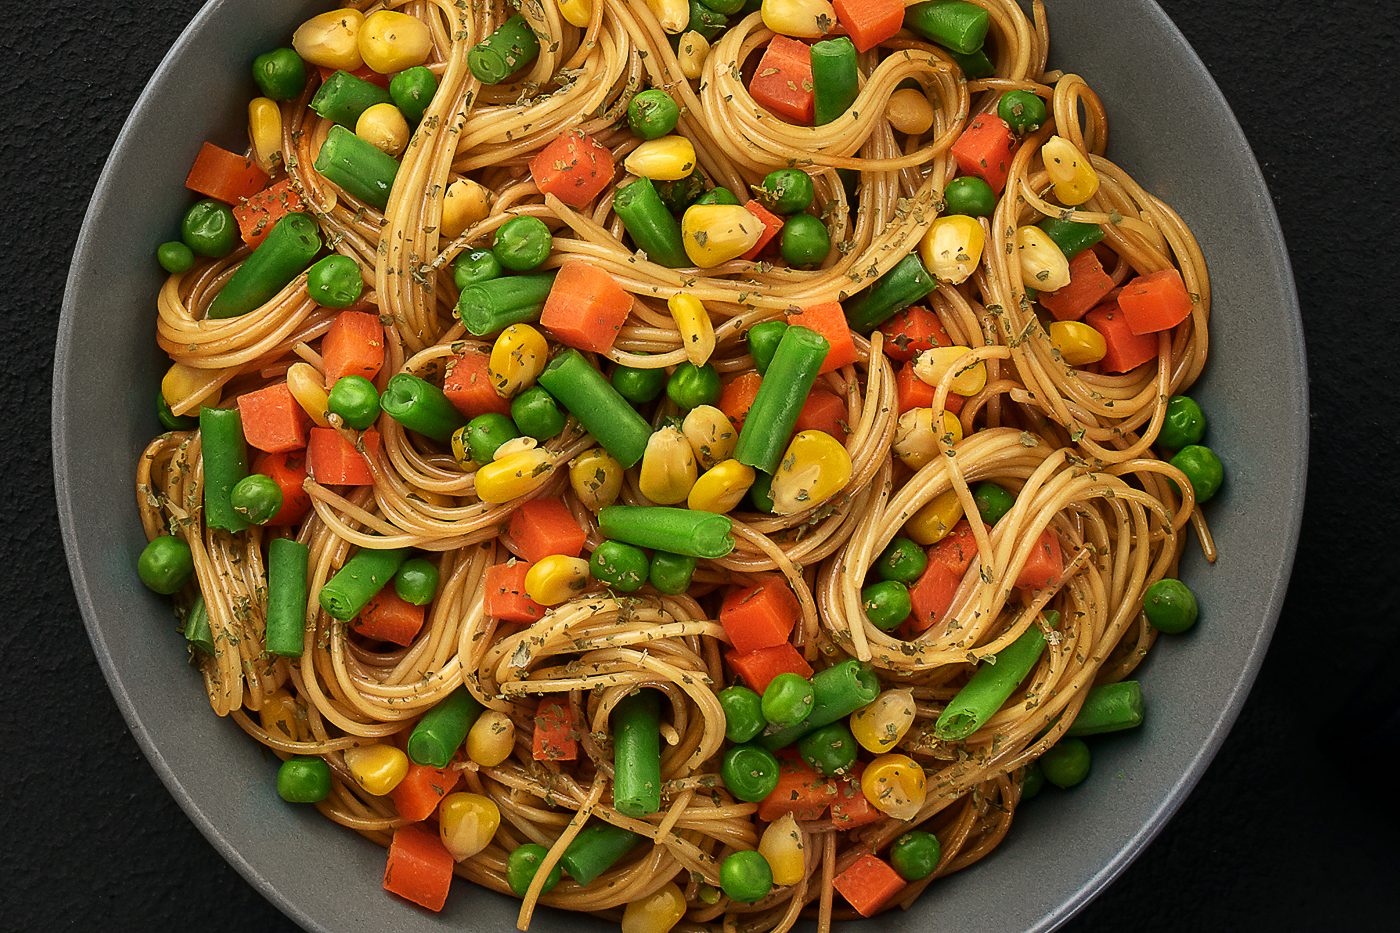 noddels, corn, green beans, Basel